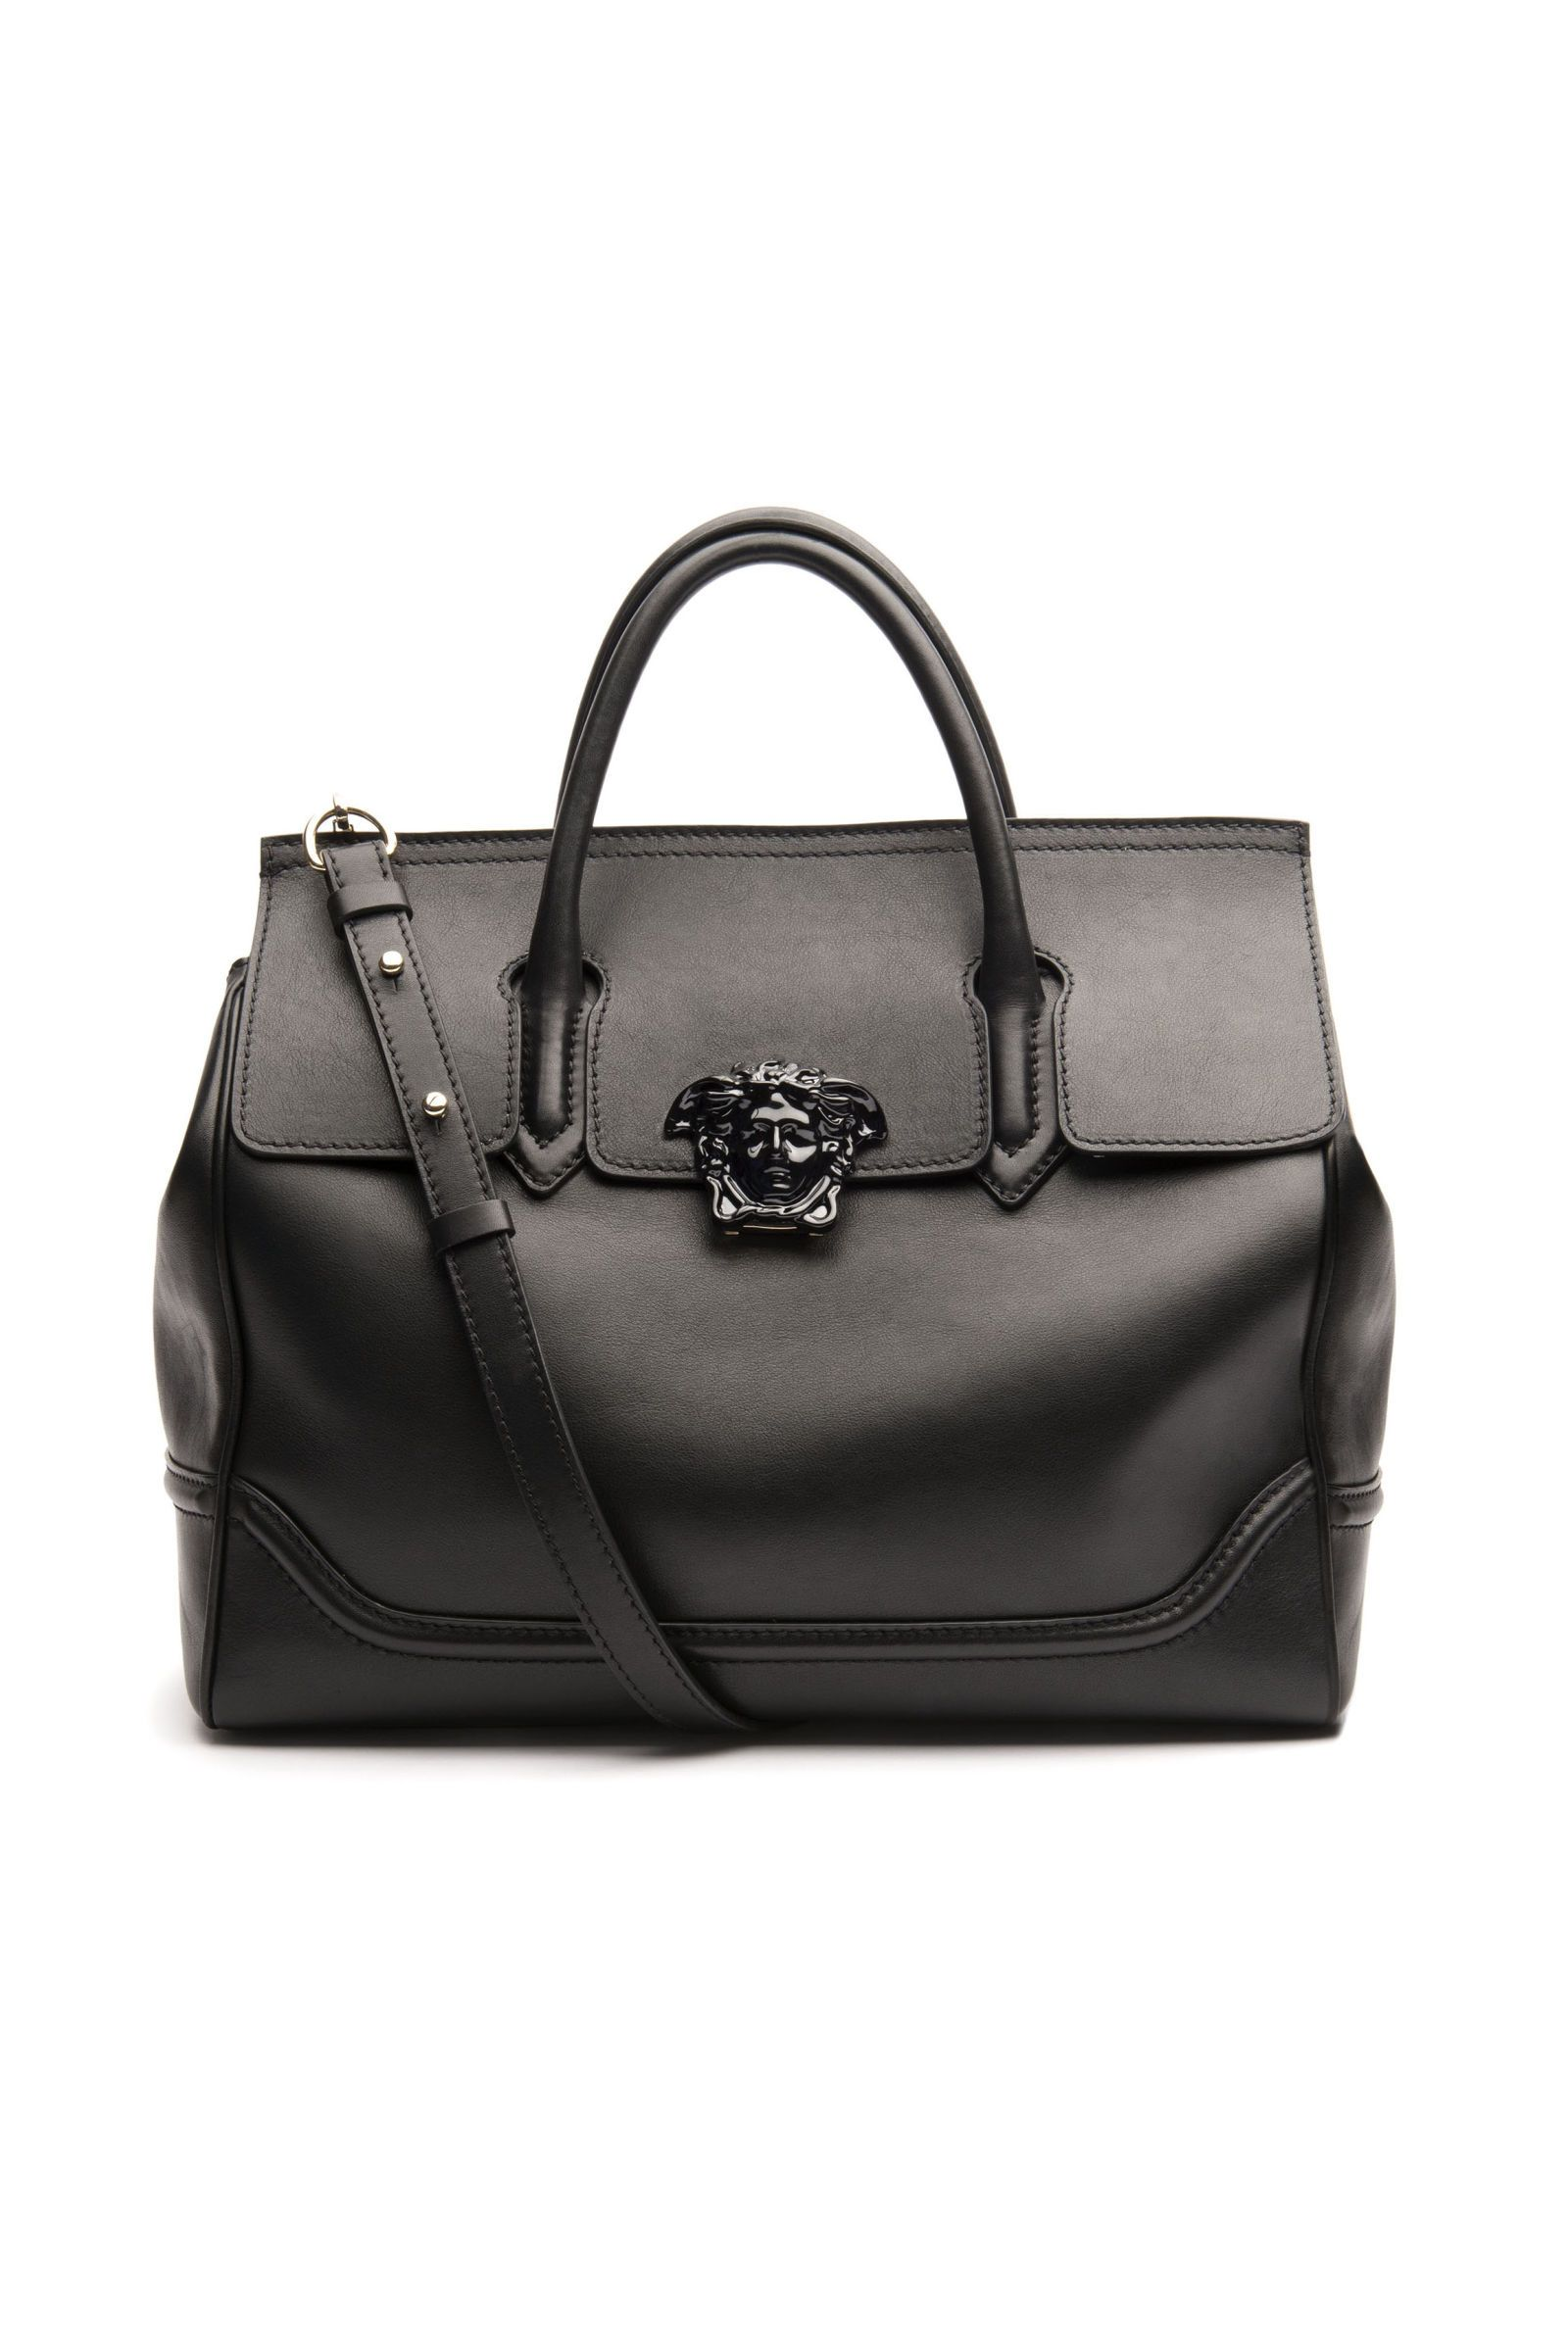 1 Bag, 1 Perfect Weekend Wardrobe   Palazzo, Versace and Empire 70b2351acd